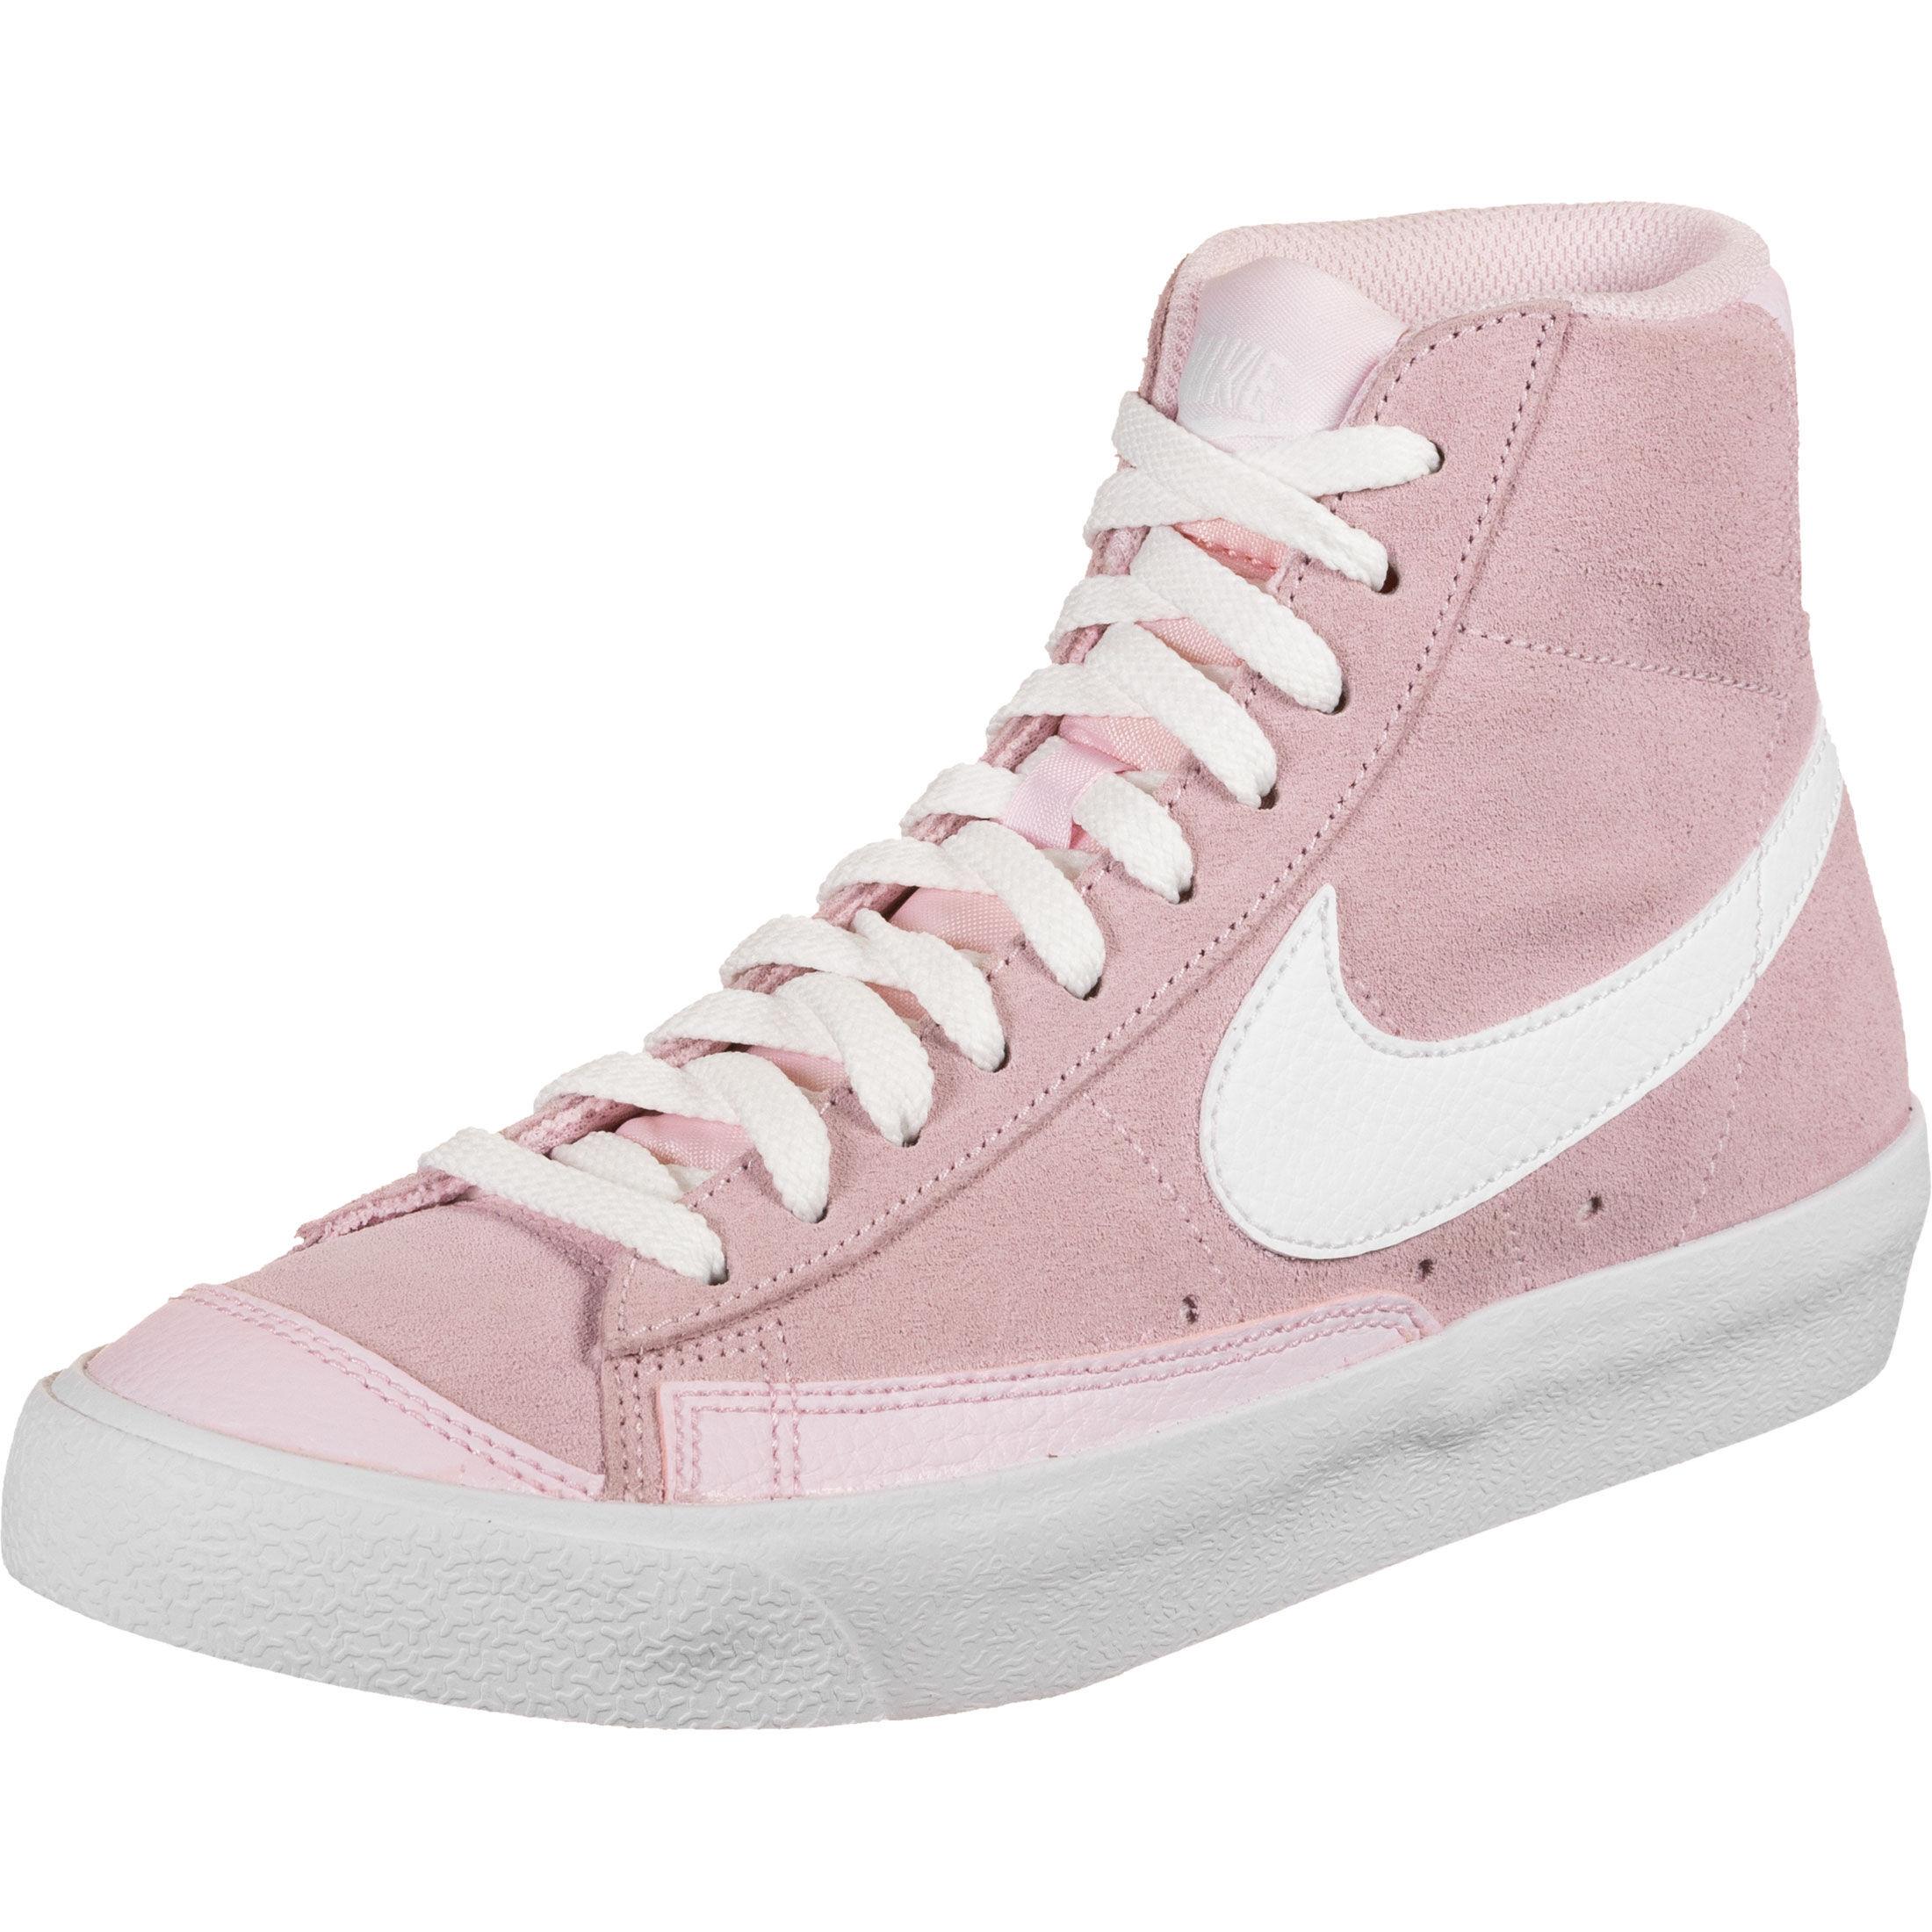 Nike Blazer Mid VNTG 77, 36 EU, femme, rose